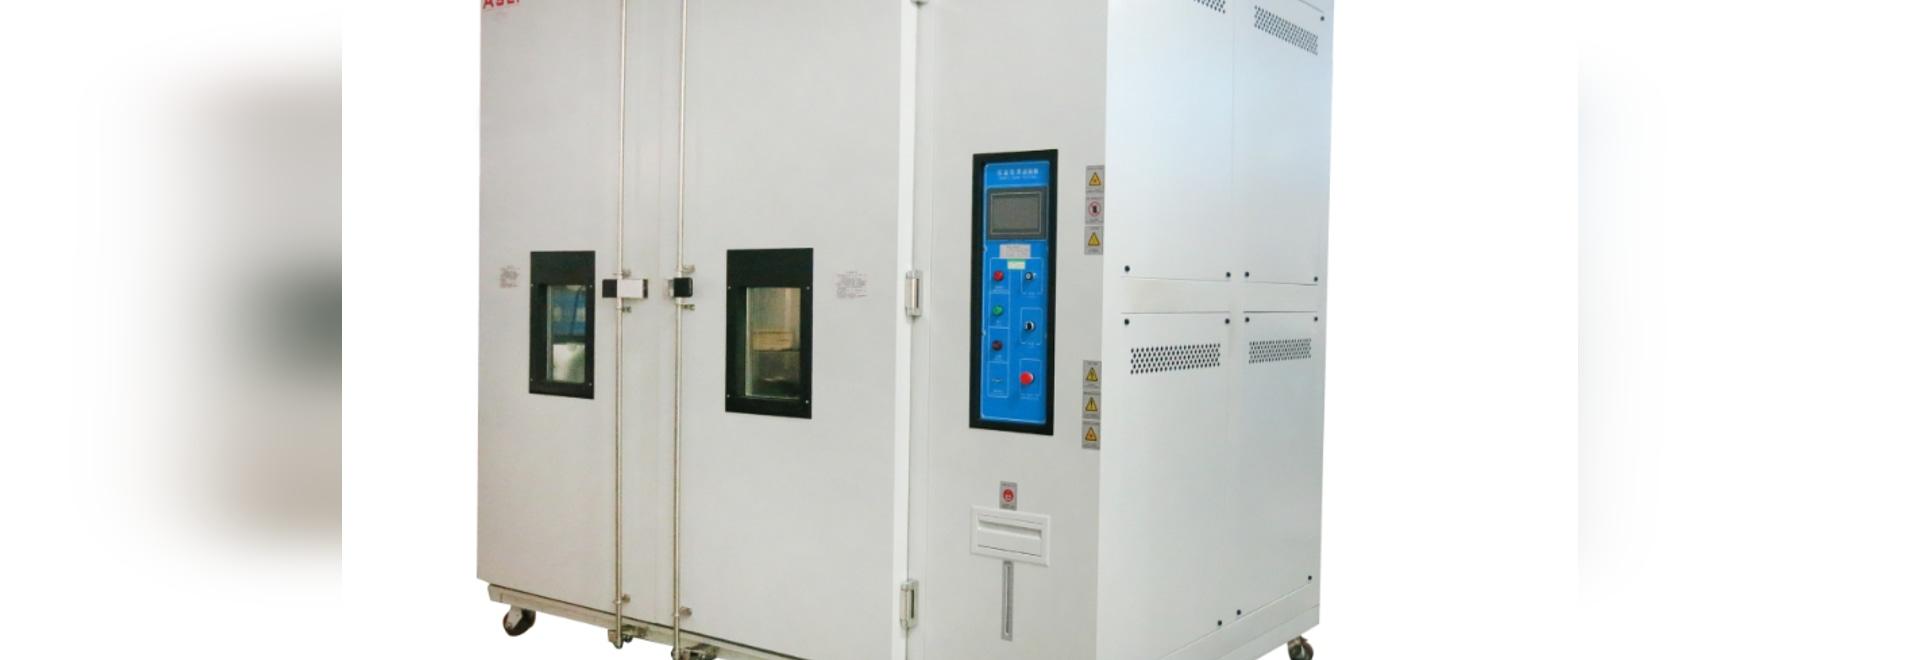 PV Panels Solar Panels Test Chambers